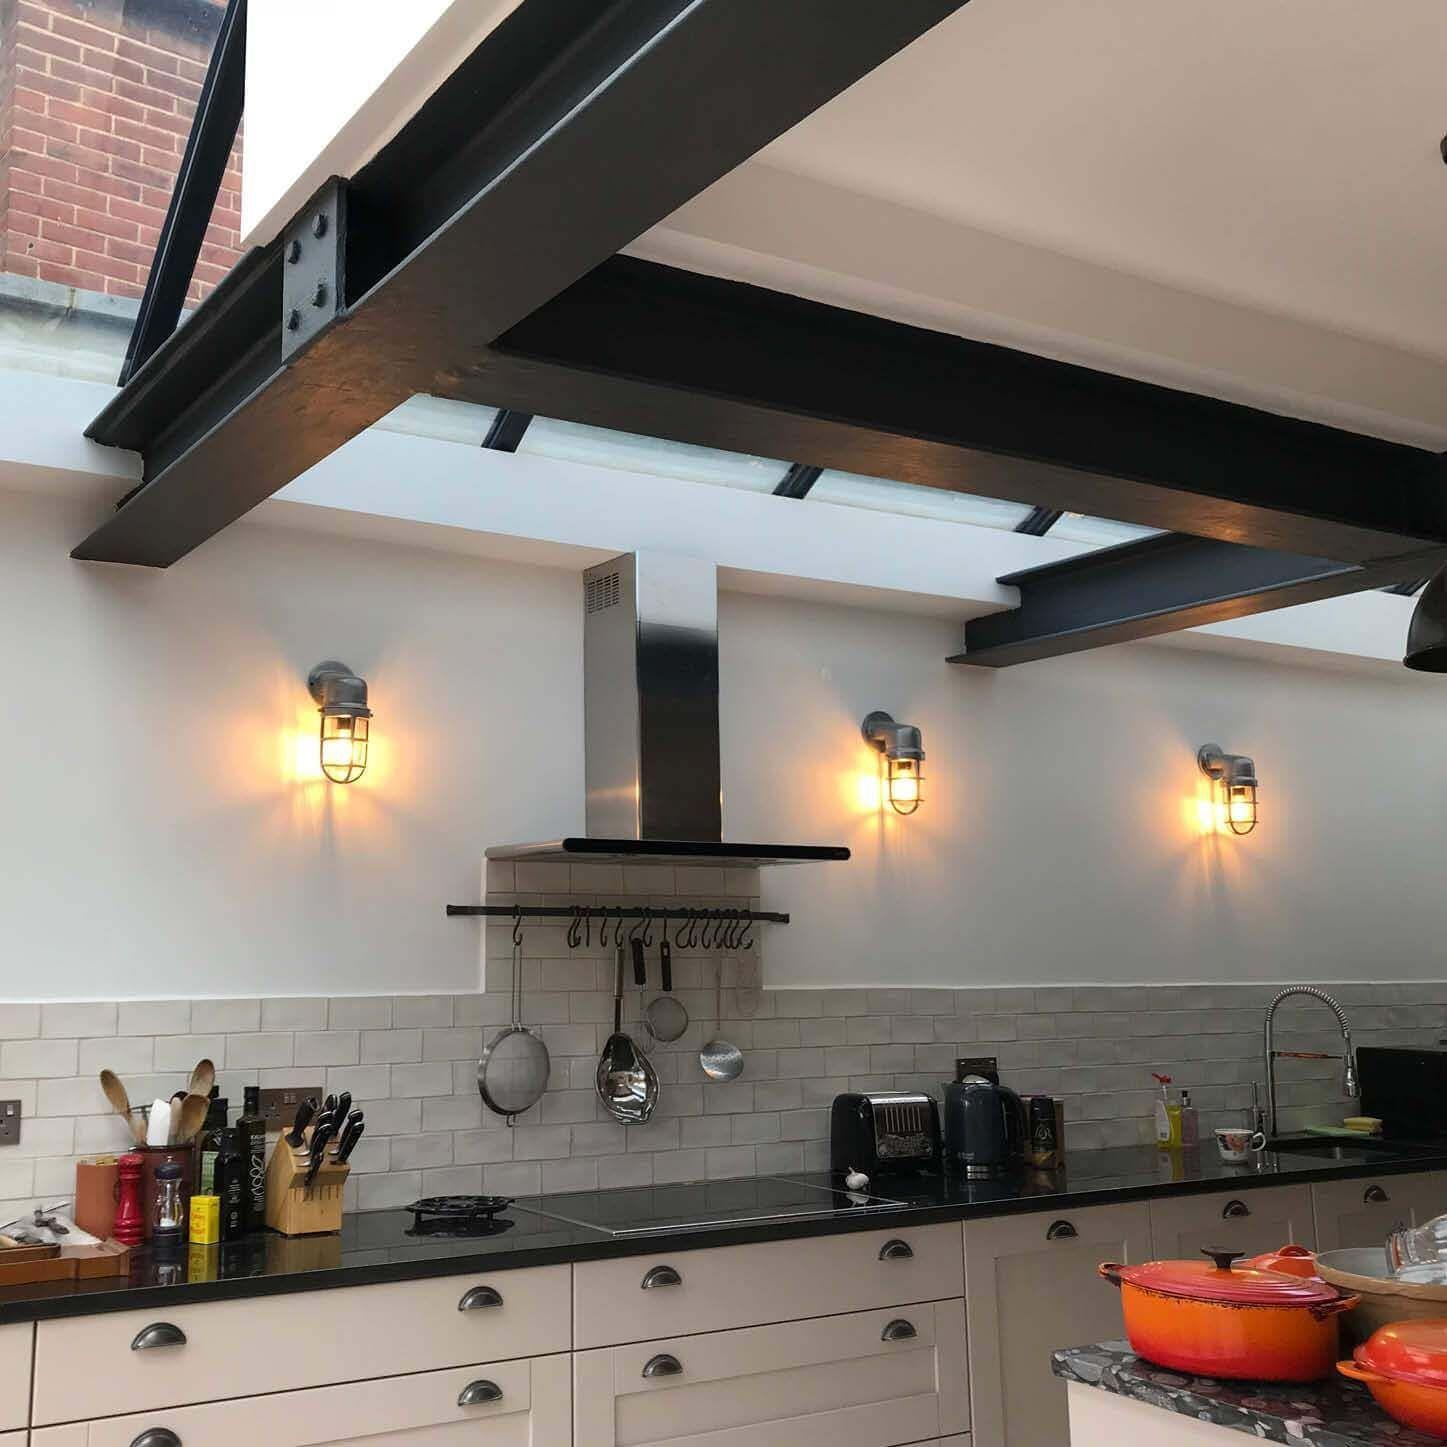 10 Diy Kitchen Lighting Ideas 2021 So Worth It Diy Kitchen Lighting Kitchen Lighting Design Kitchen Wall Lights